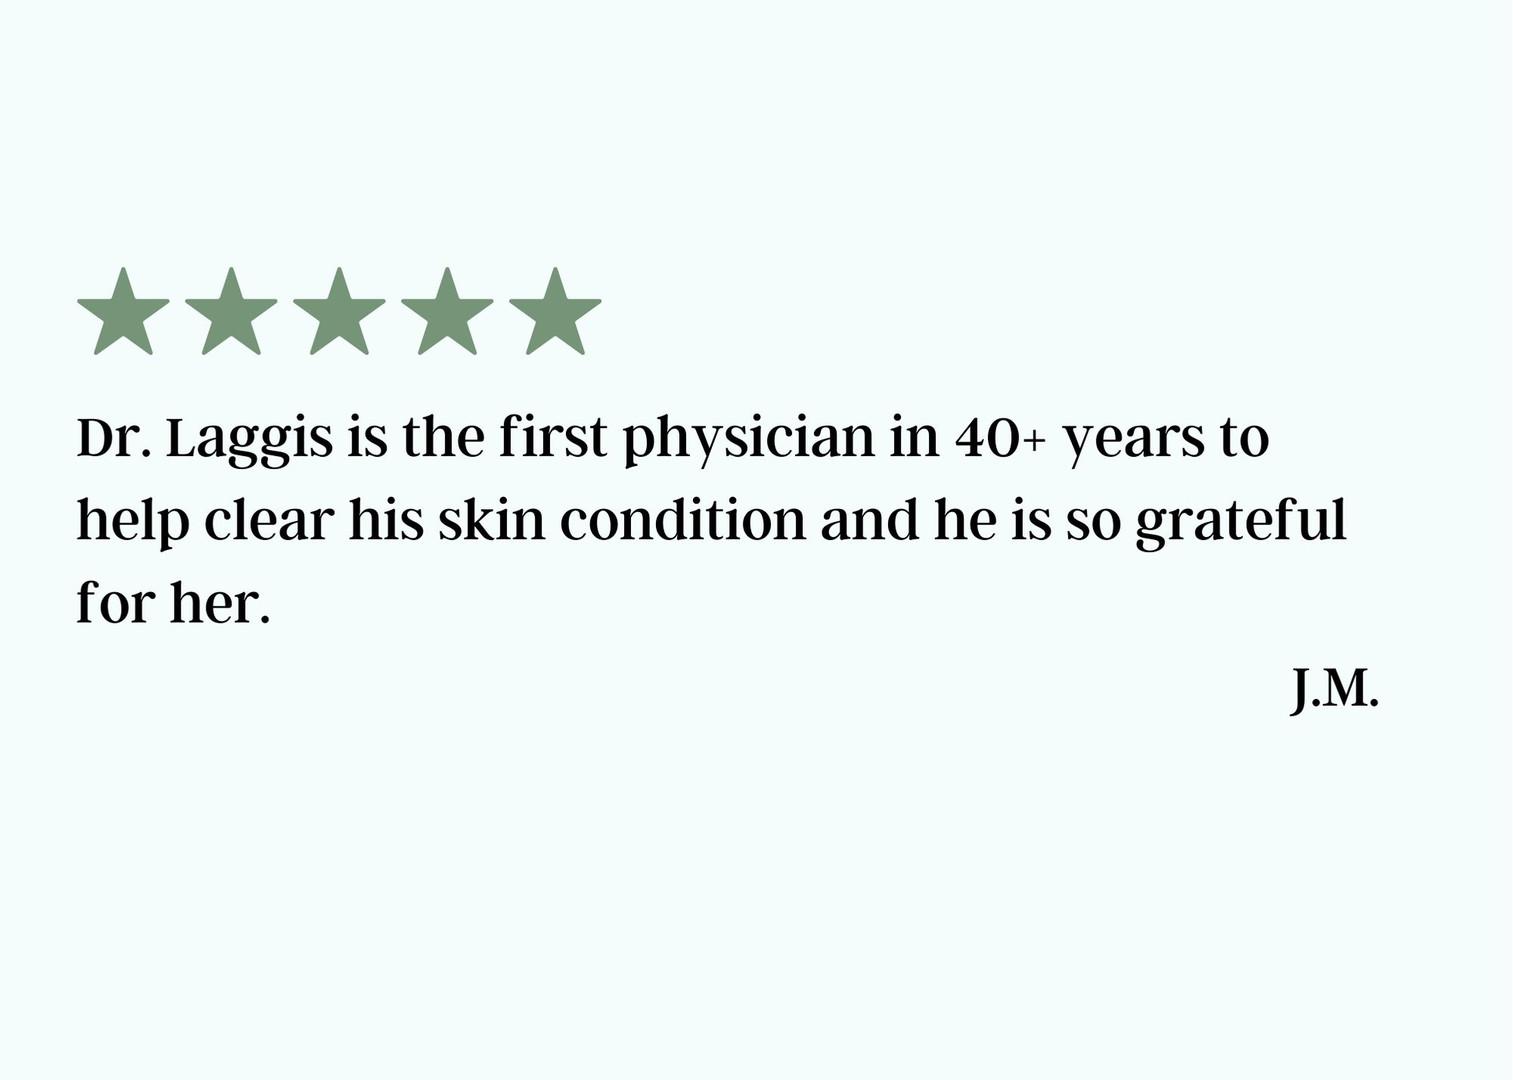 Dr. Laggis Testimonal February 2021